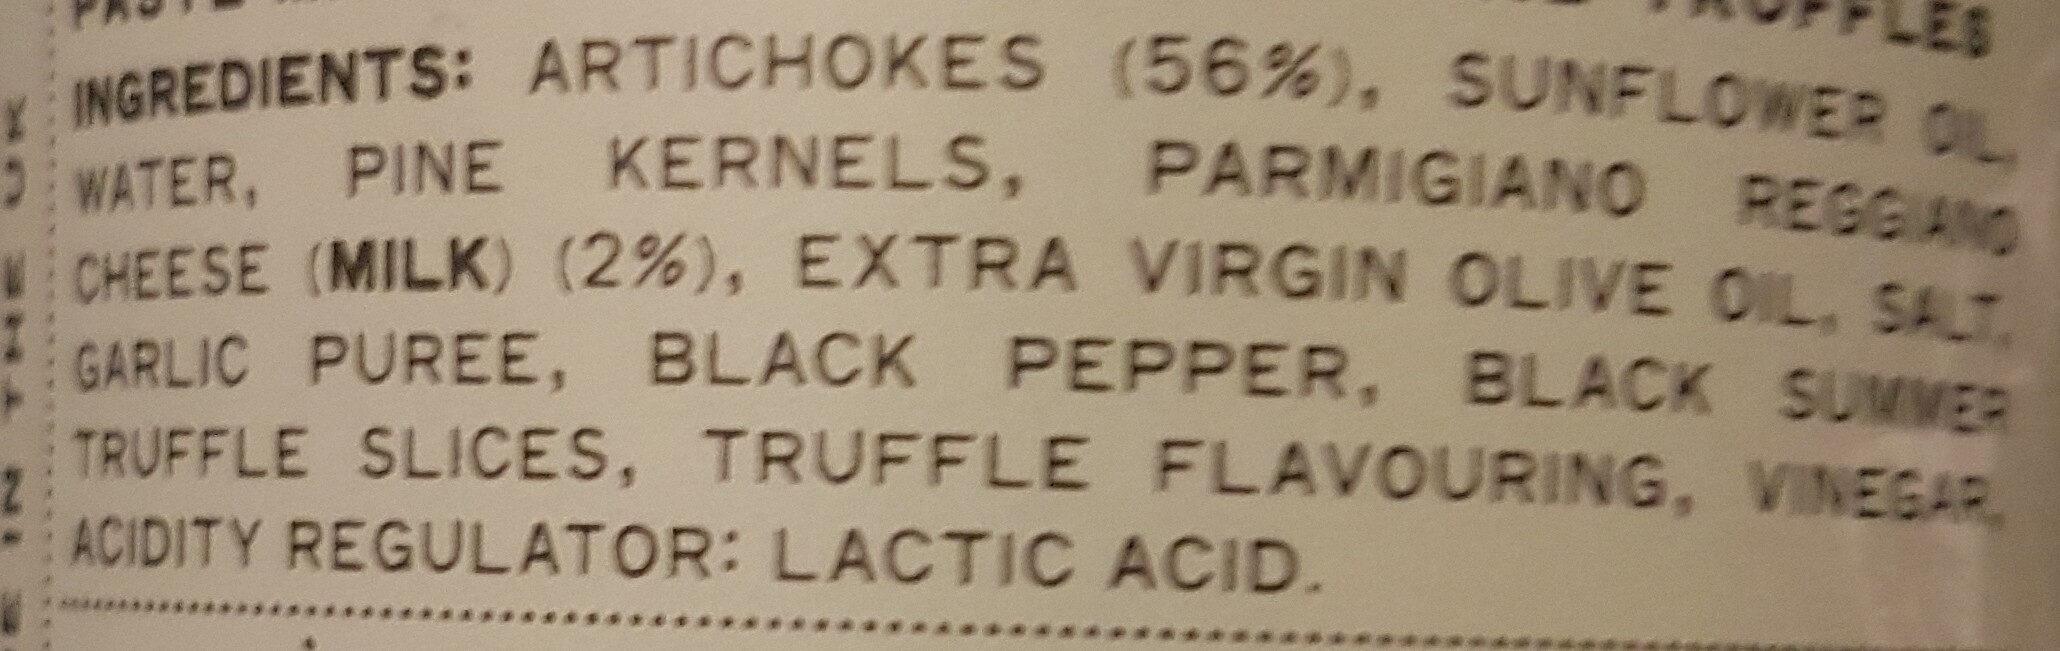 Truffle and artichoke - Ingrédients - en